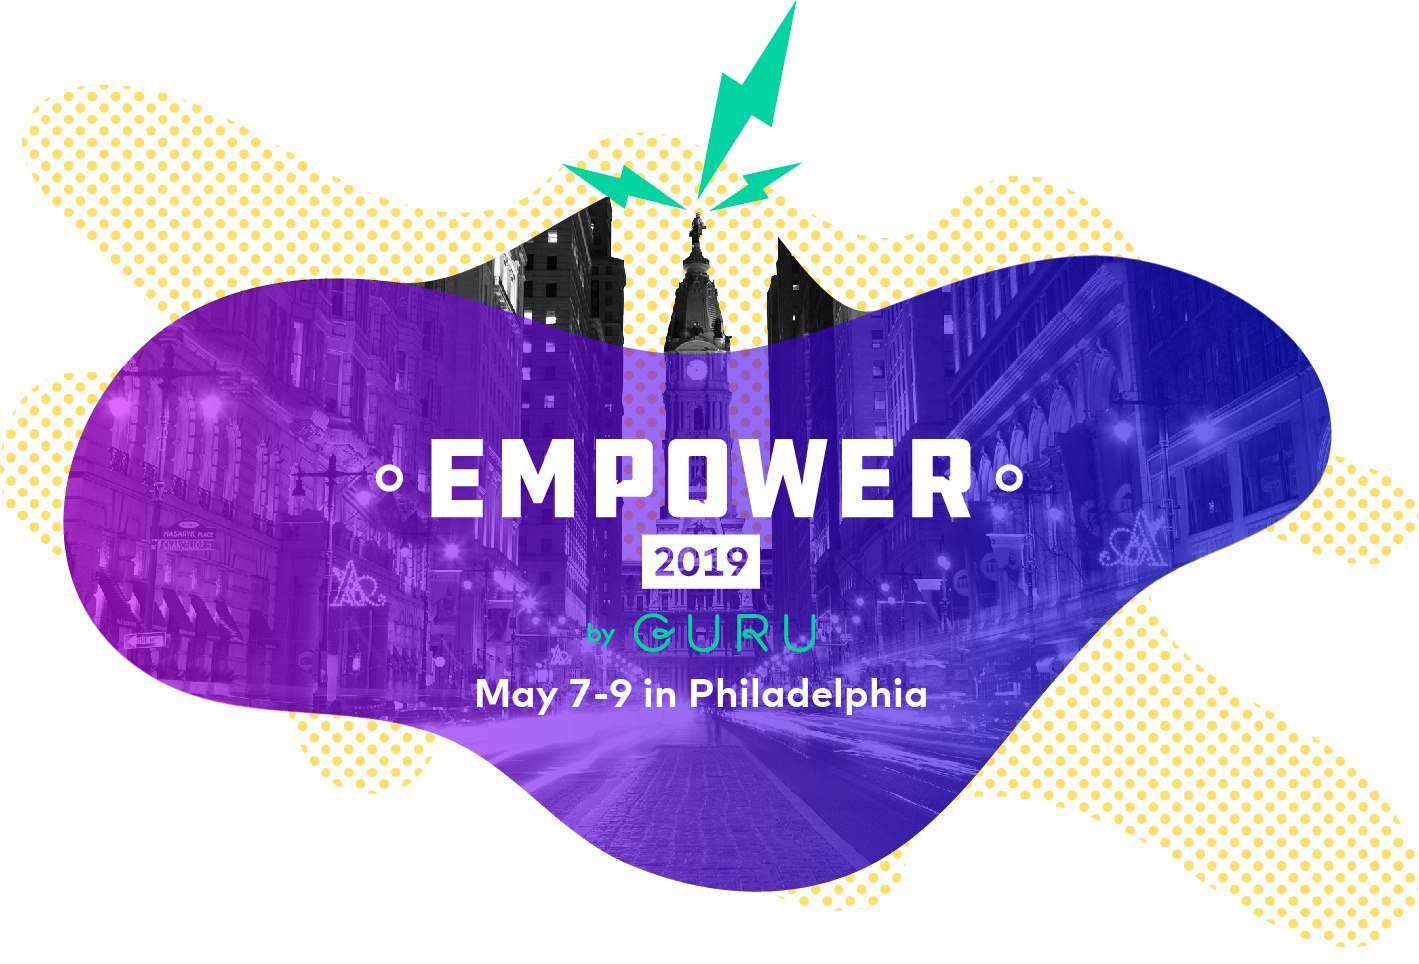 empower-email-header-hi-res